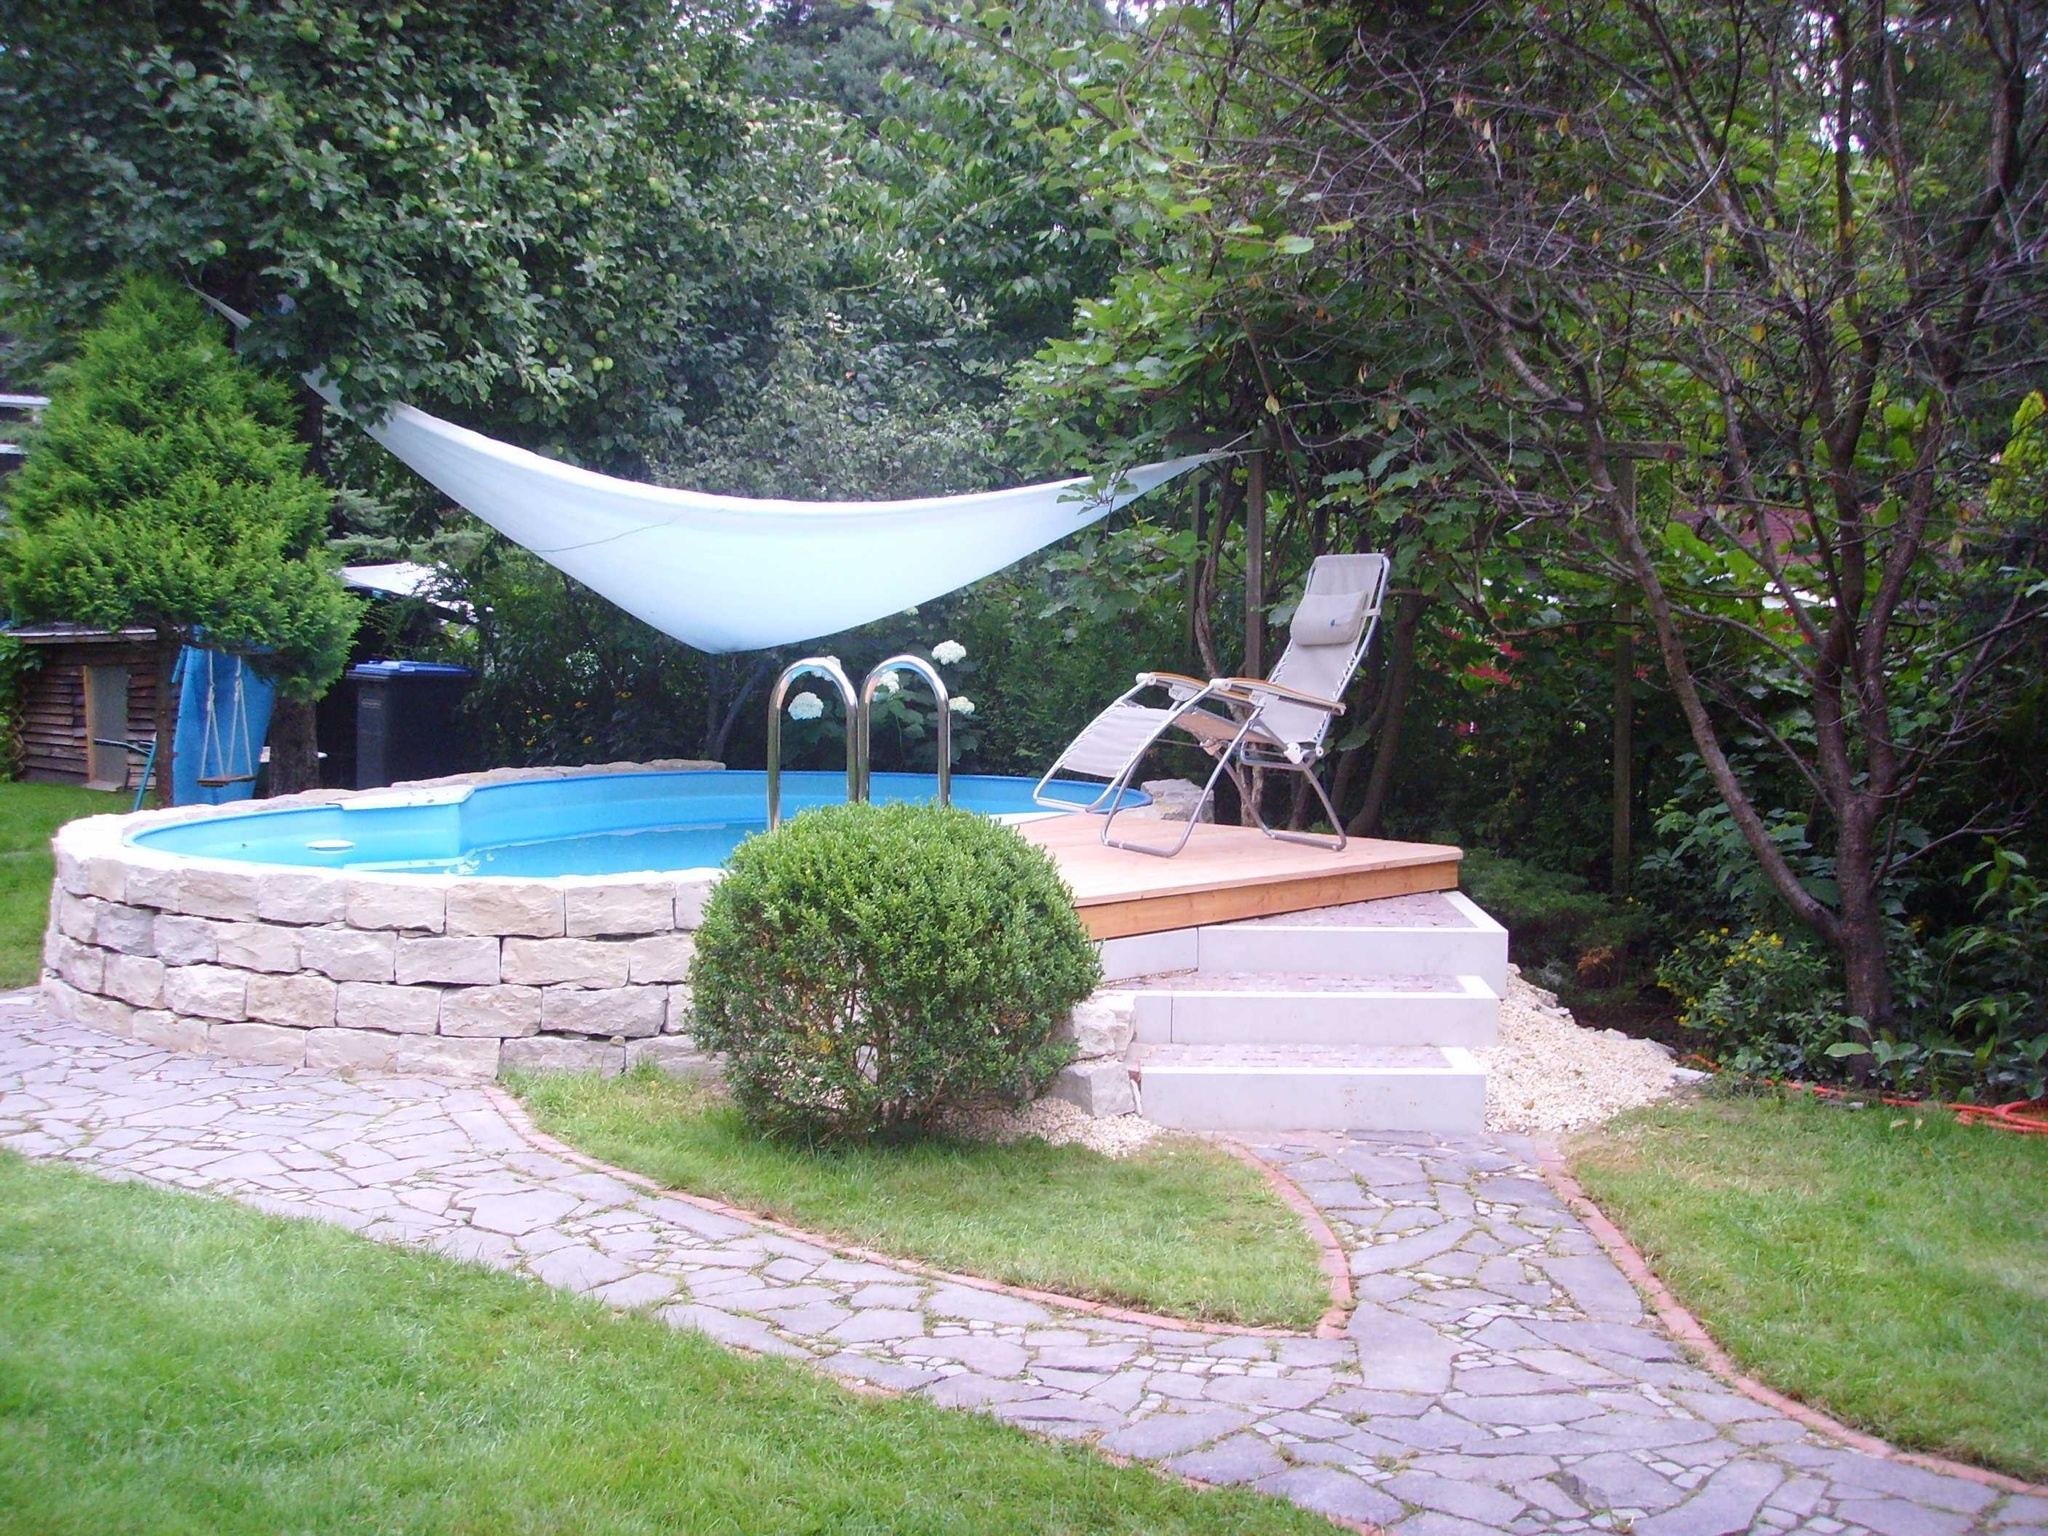 gartenideen mit pool luxurious. Black Bedroom Furniture Sets. Home Design Ideas